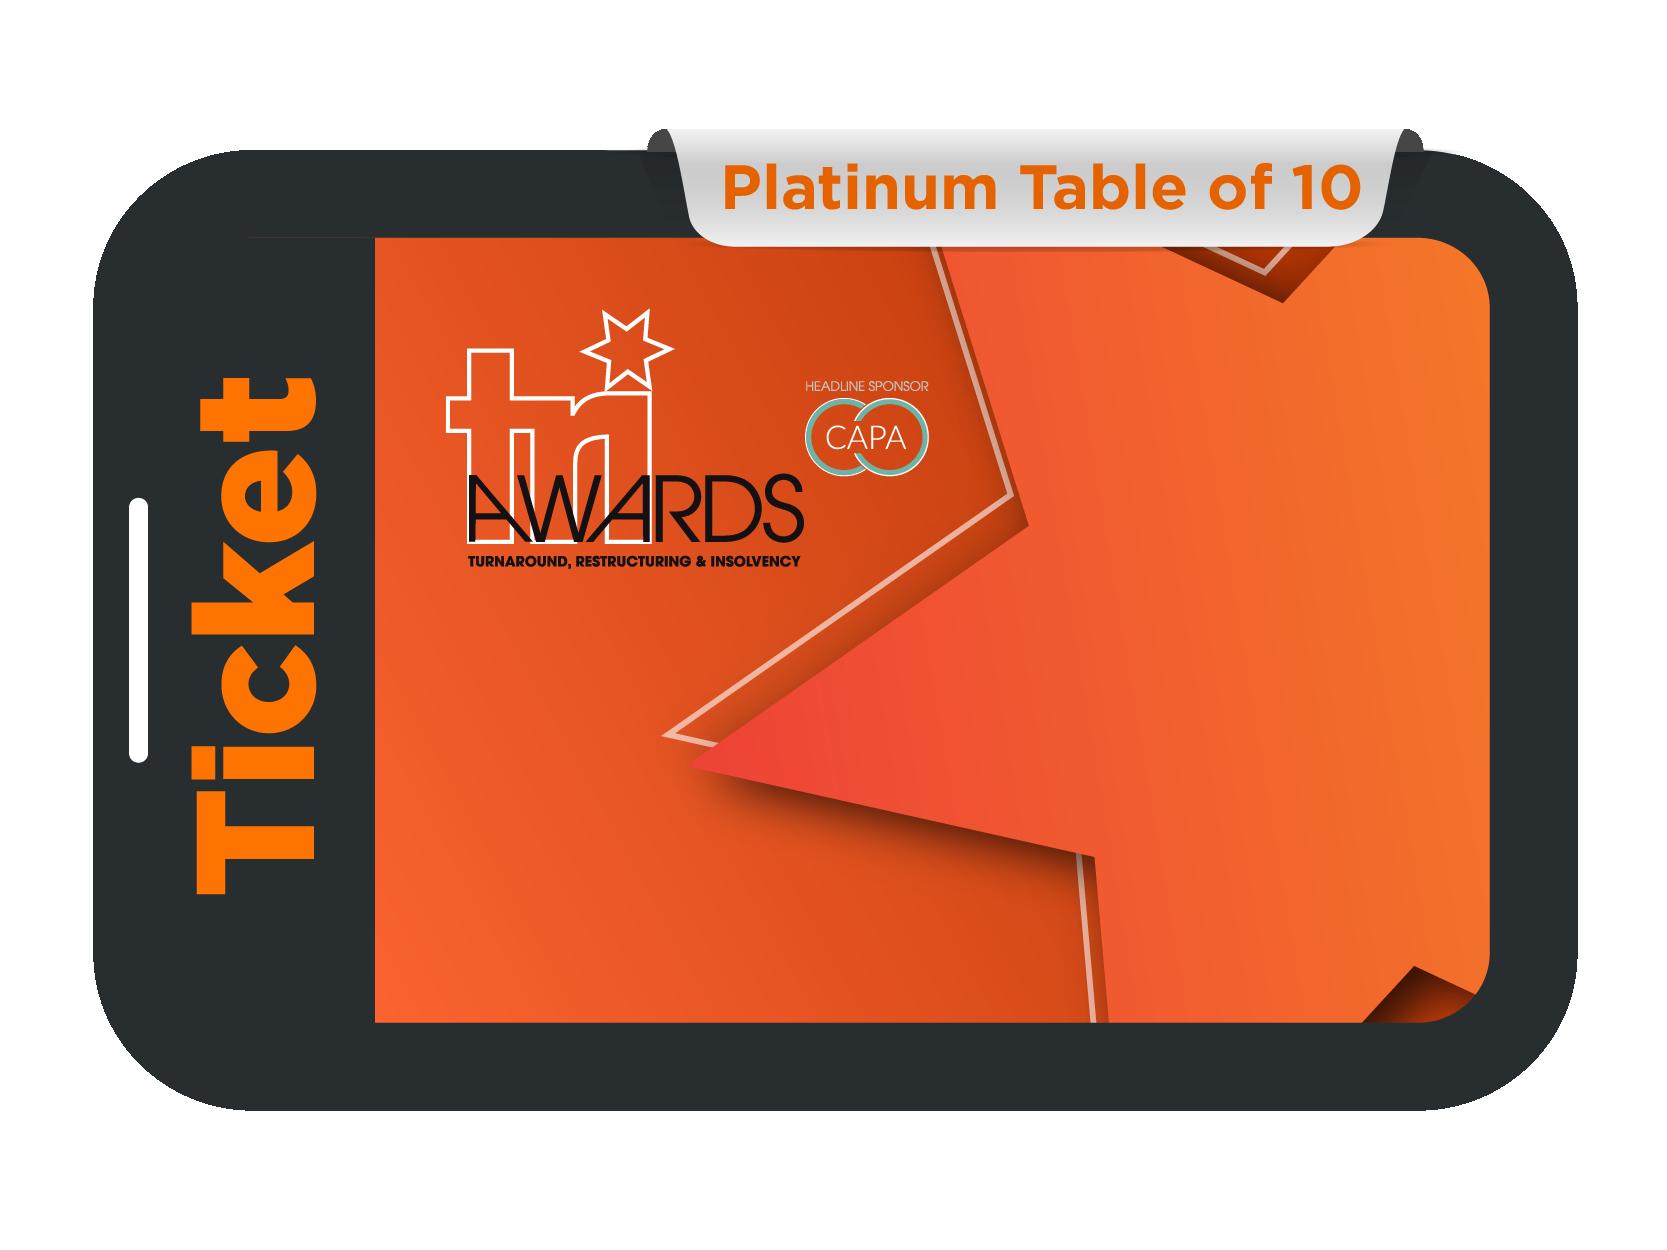 Platinum Table of 10 - TRI Awards 2021